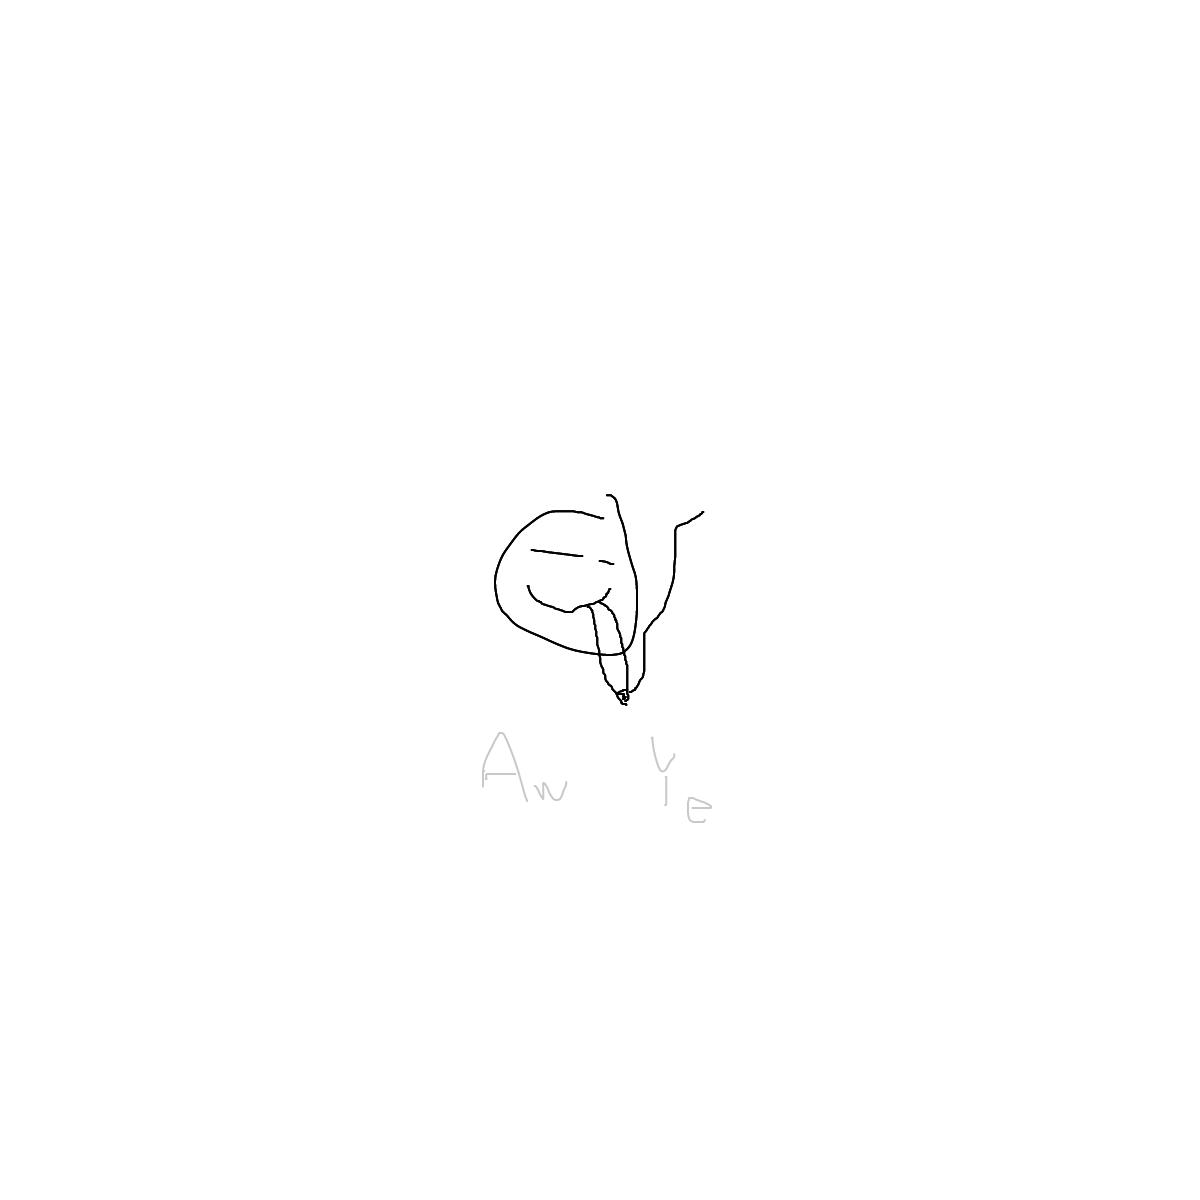 BAAAM drawing#14861 lat:43.6666946411132800lng: -79.3791351318359400